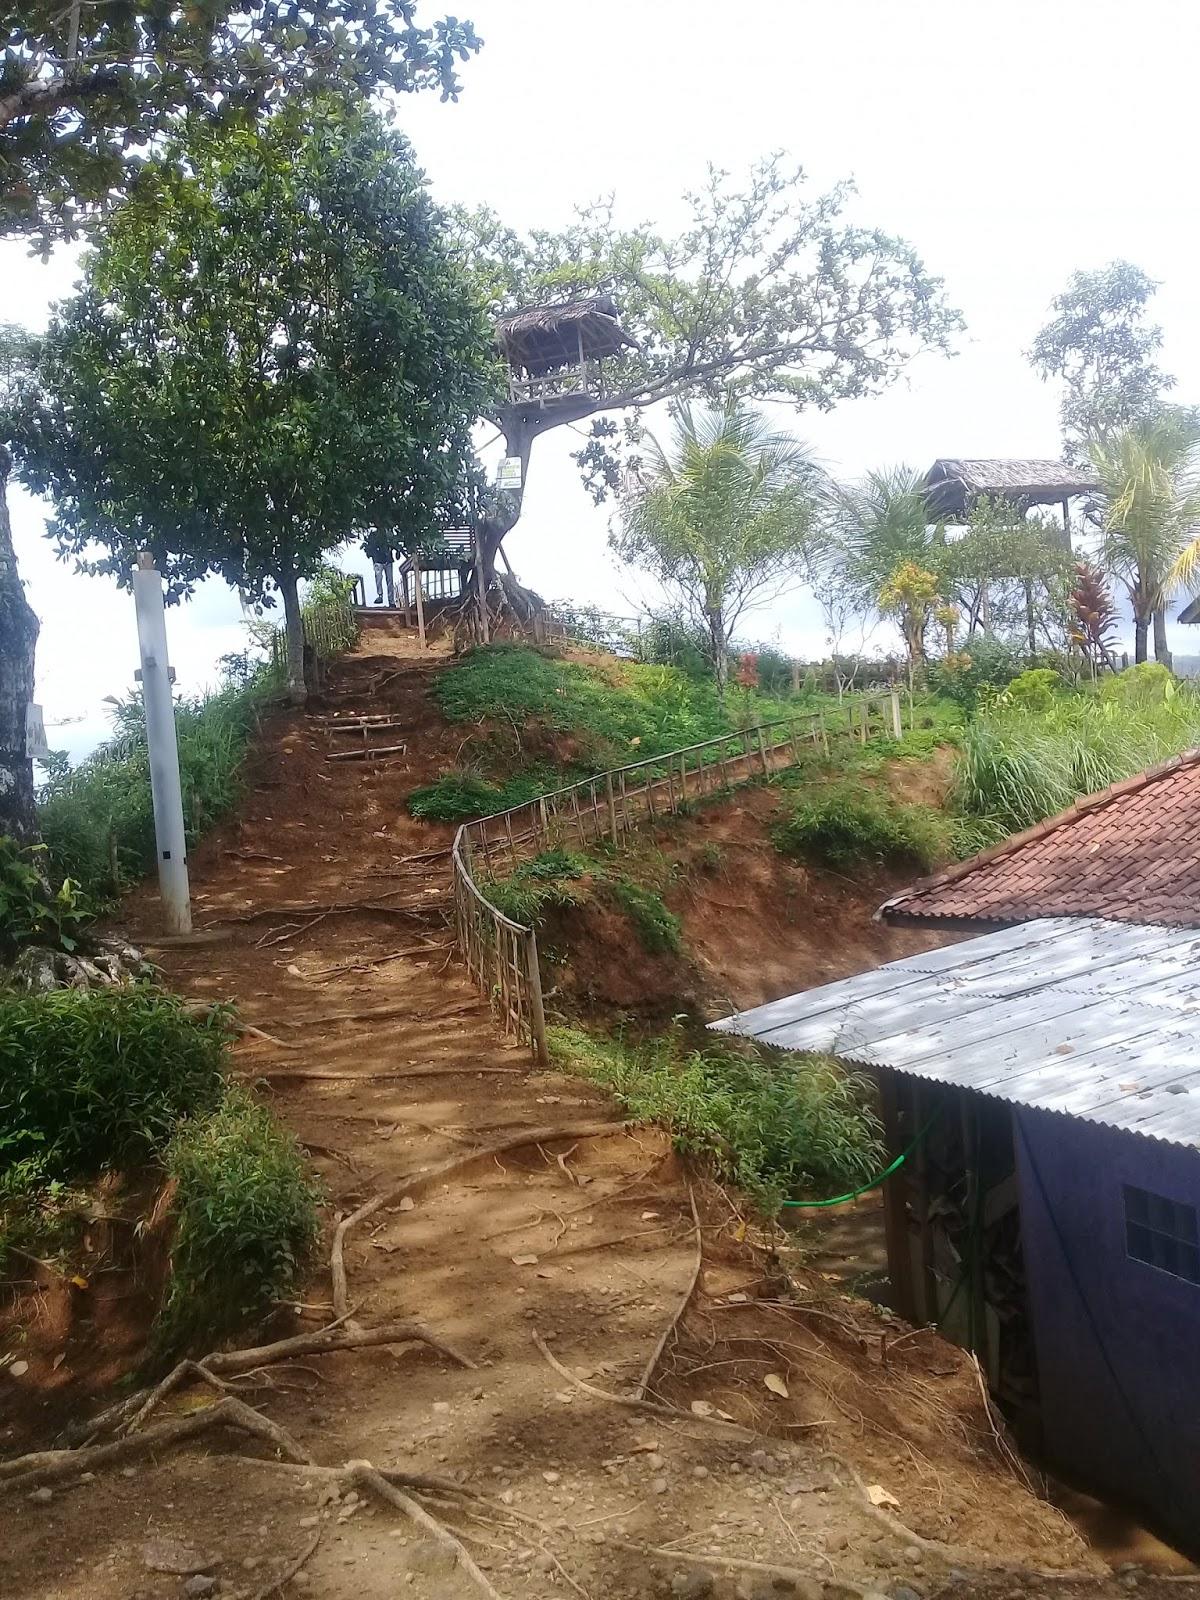 Hendra Ndra Katapang Matenggeng Dayeuhluhur Tempat Wisata